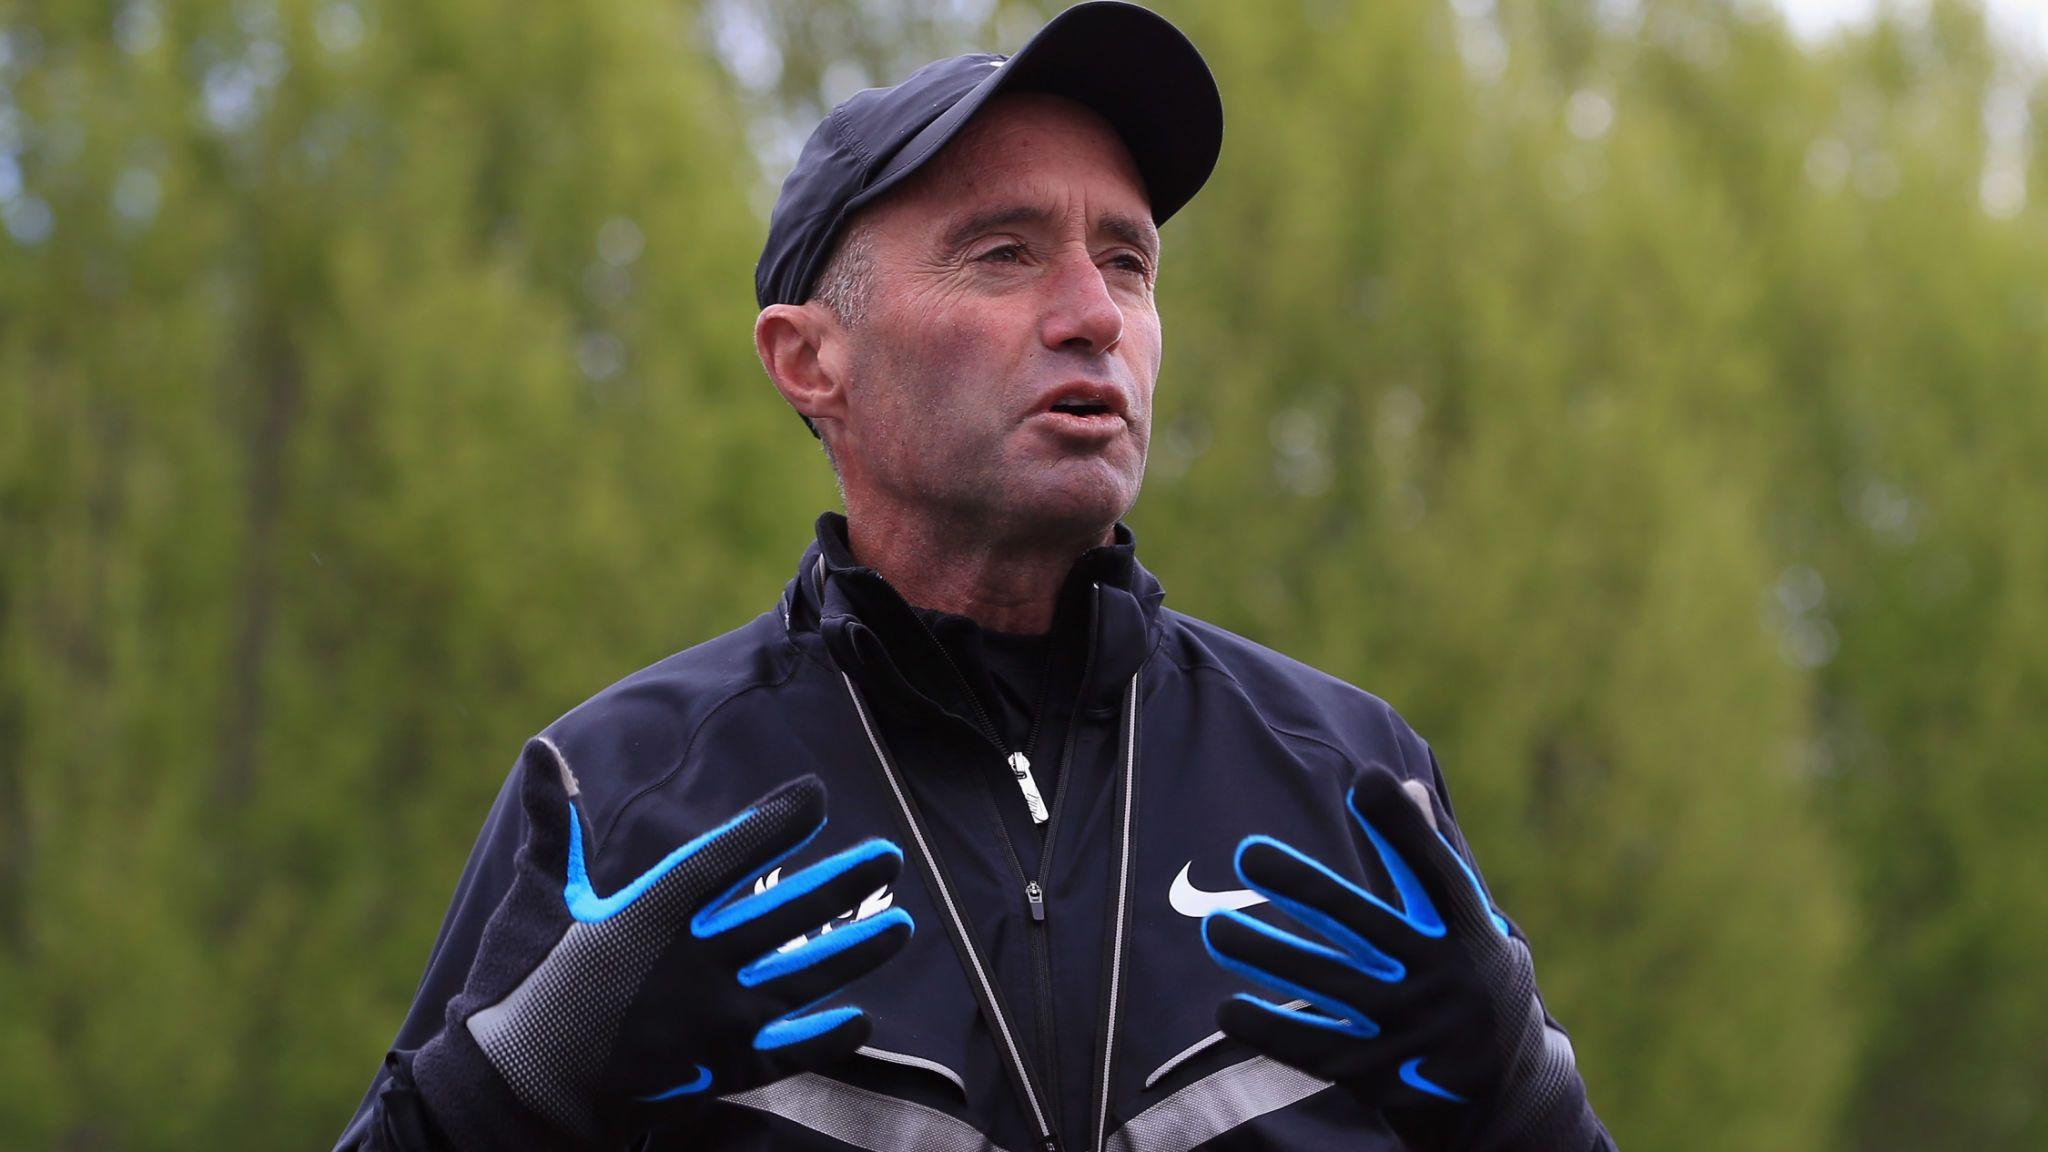 Wada diz que vai investigar todos os atletas do Nike Oregon Project